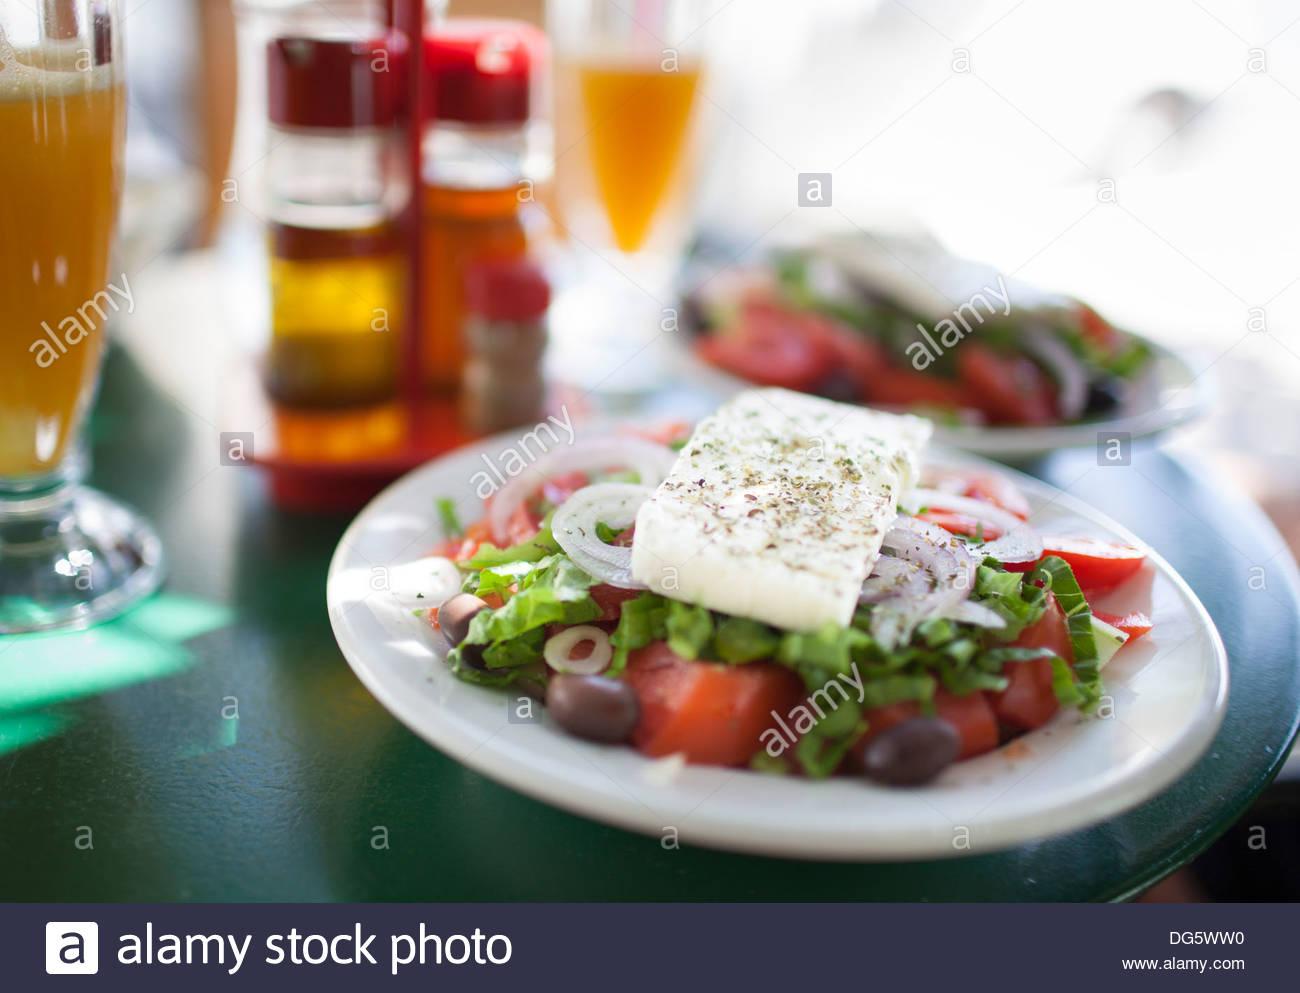 Veg salad served in a cafe - Stock Image